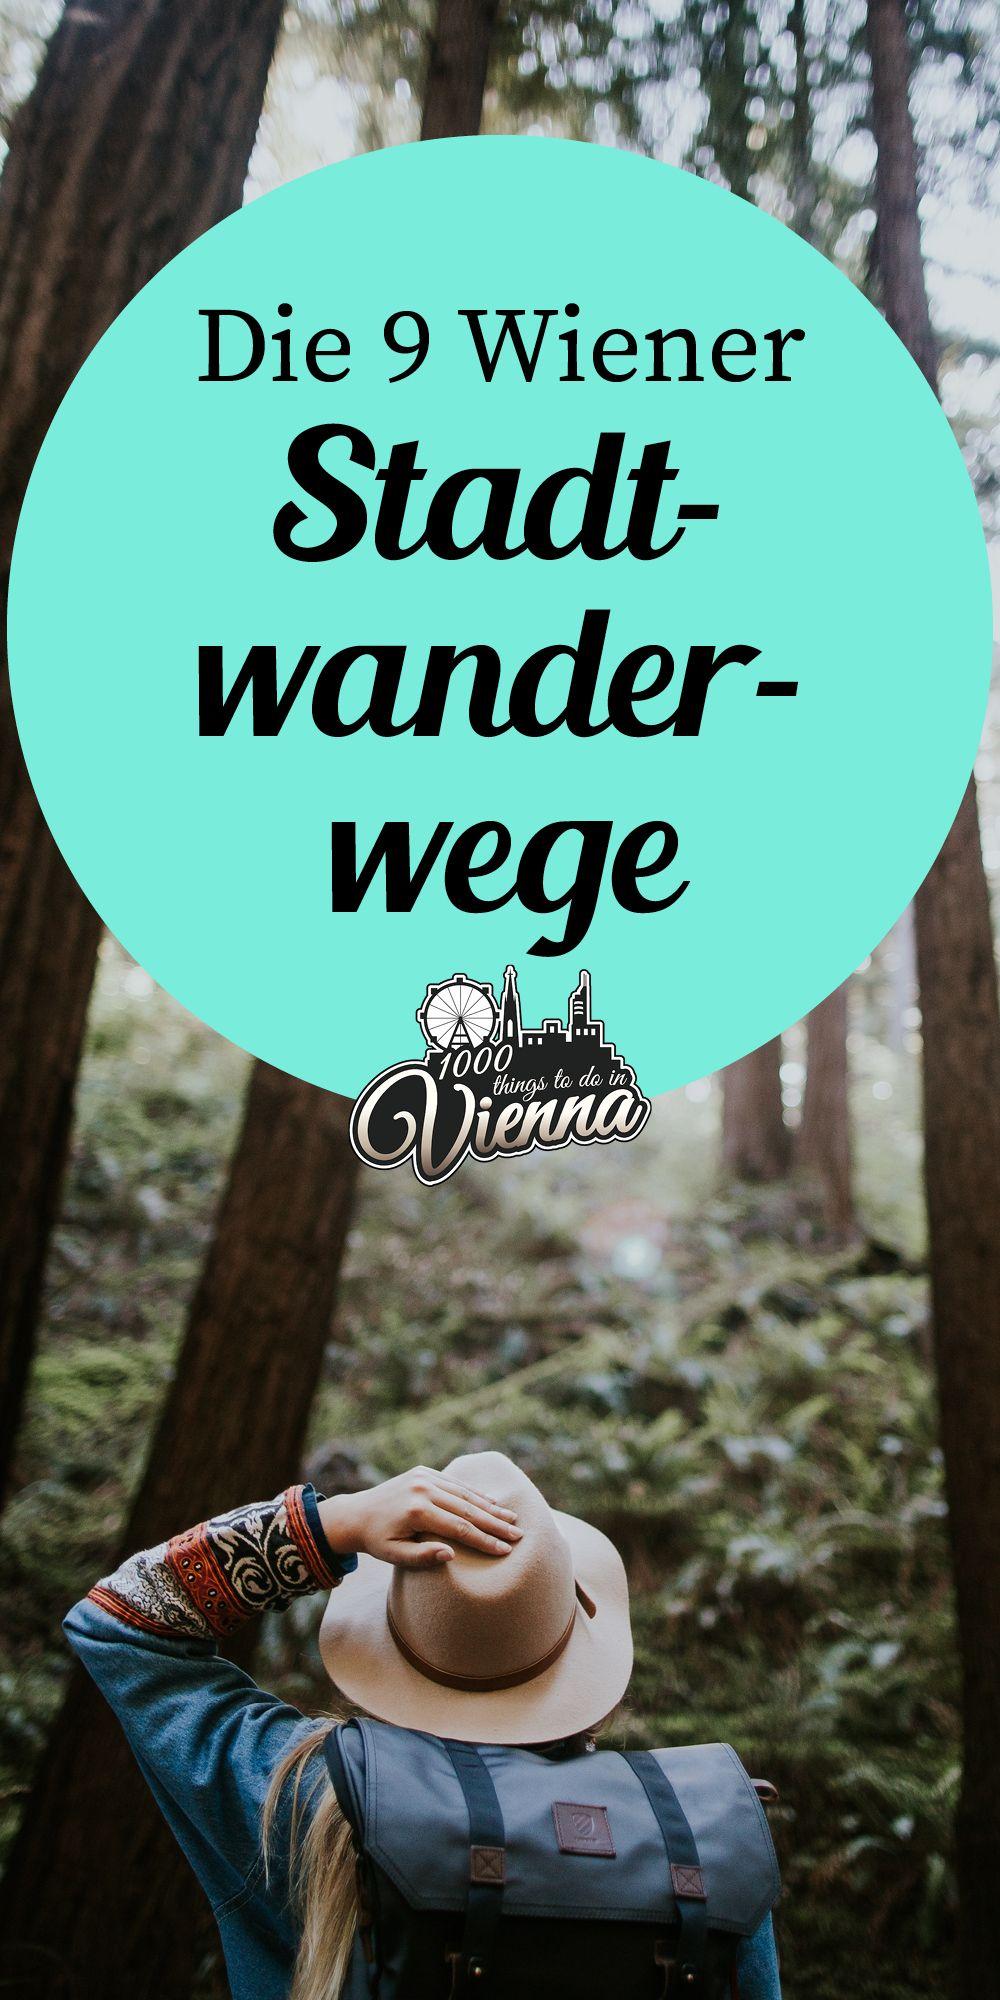 Entdecke entlang der Wiener Stadtwanderwege die schönsten Ecken Wiens | 1000things